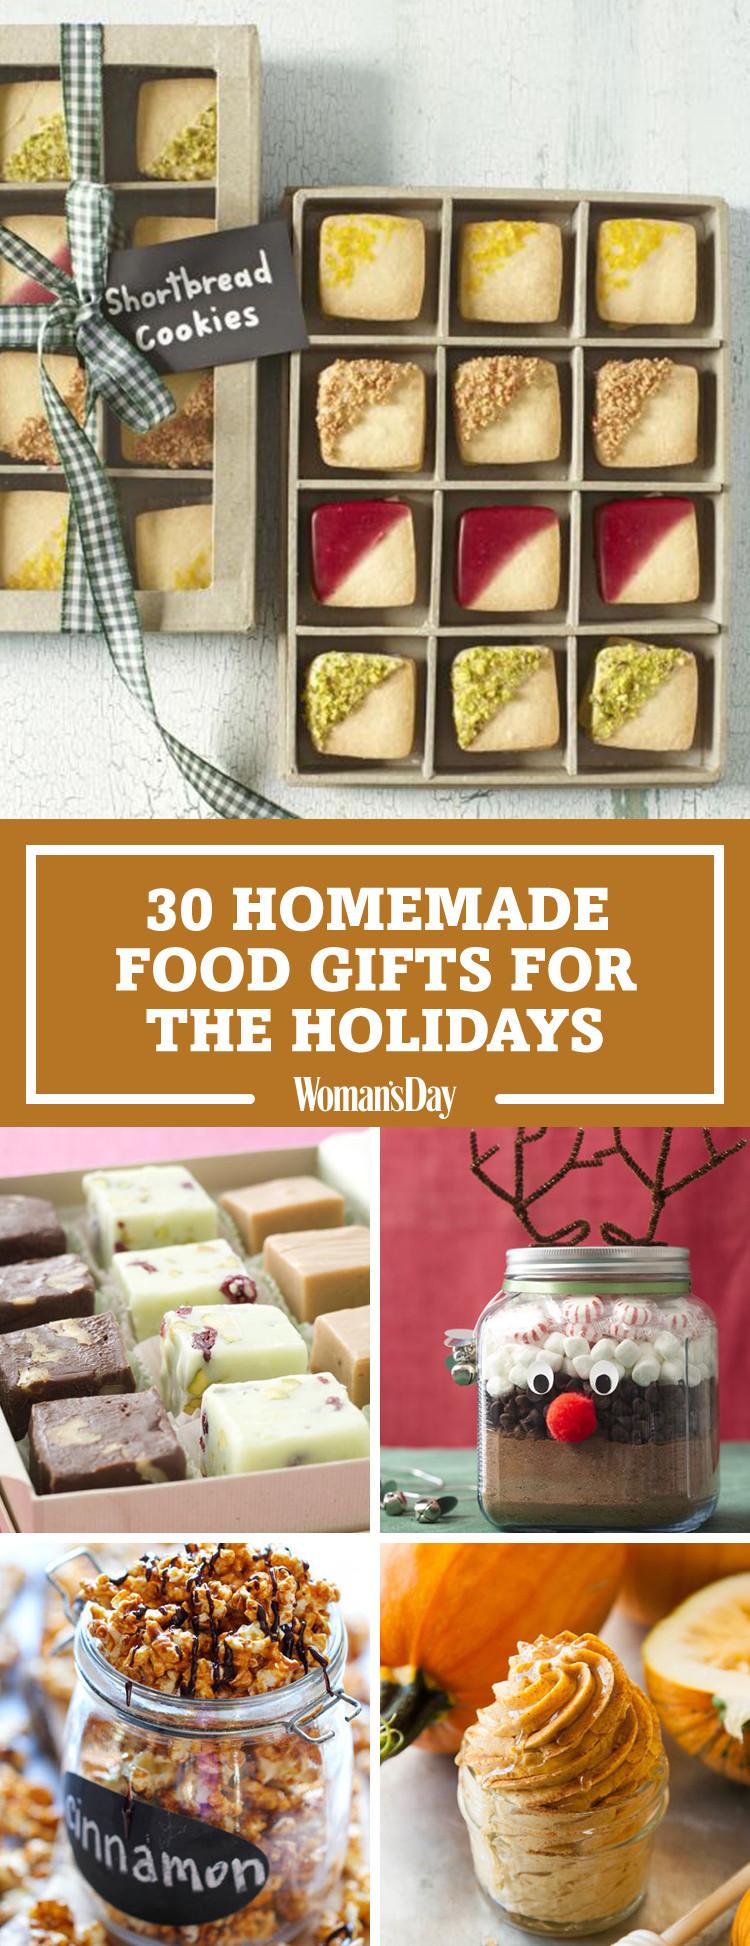 Easy Christmas Food Gifts  35 Homemade Christmas Food Gifts Best Edible Holiday